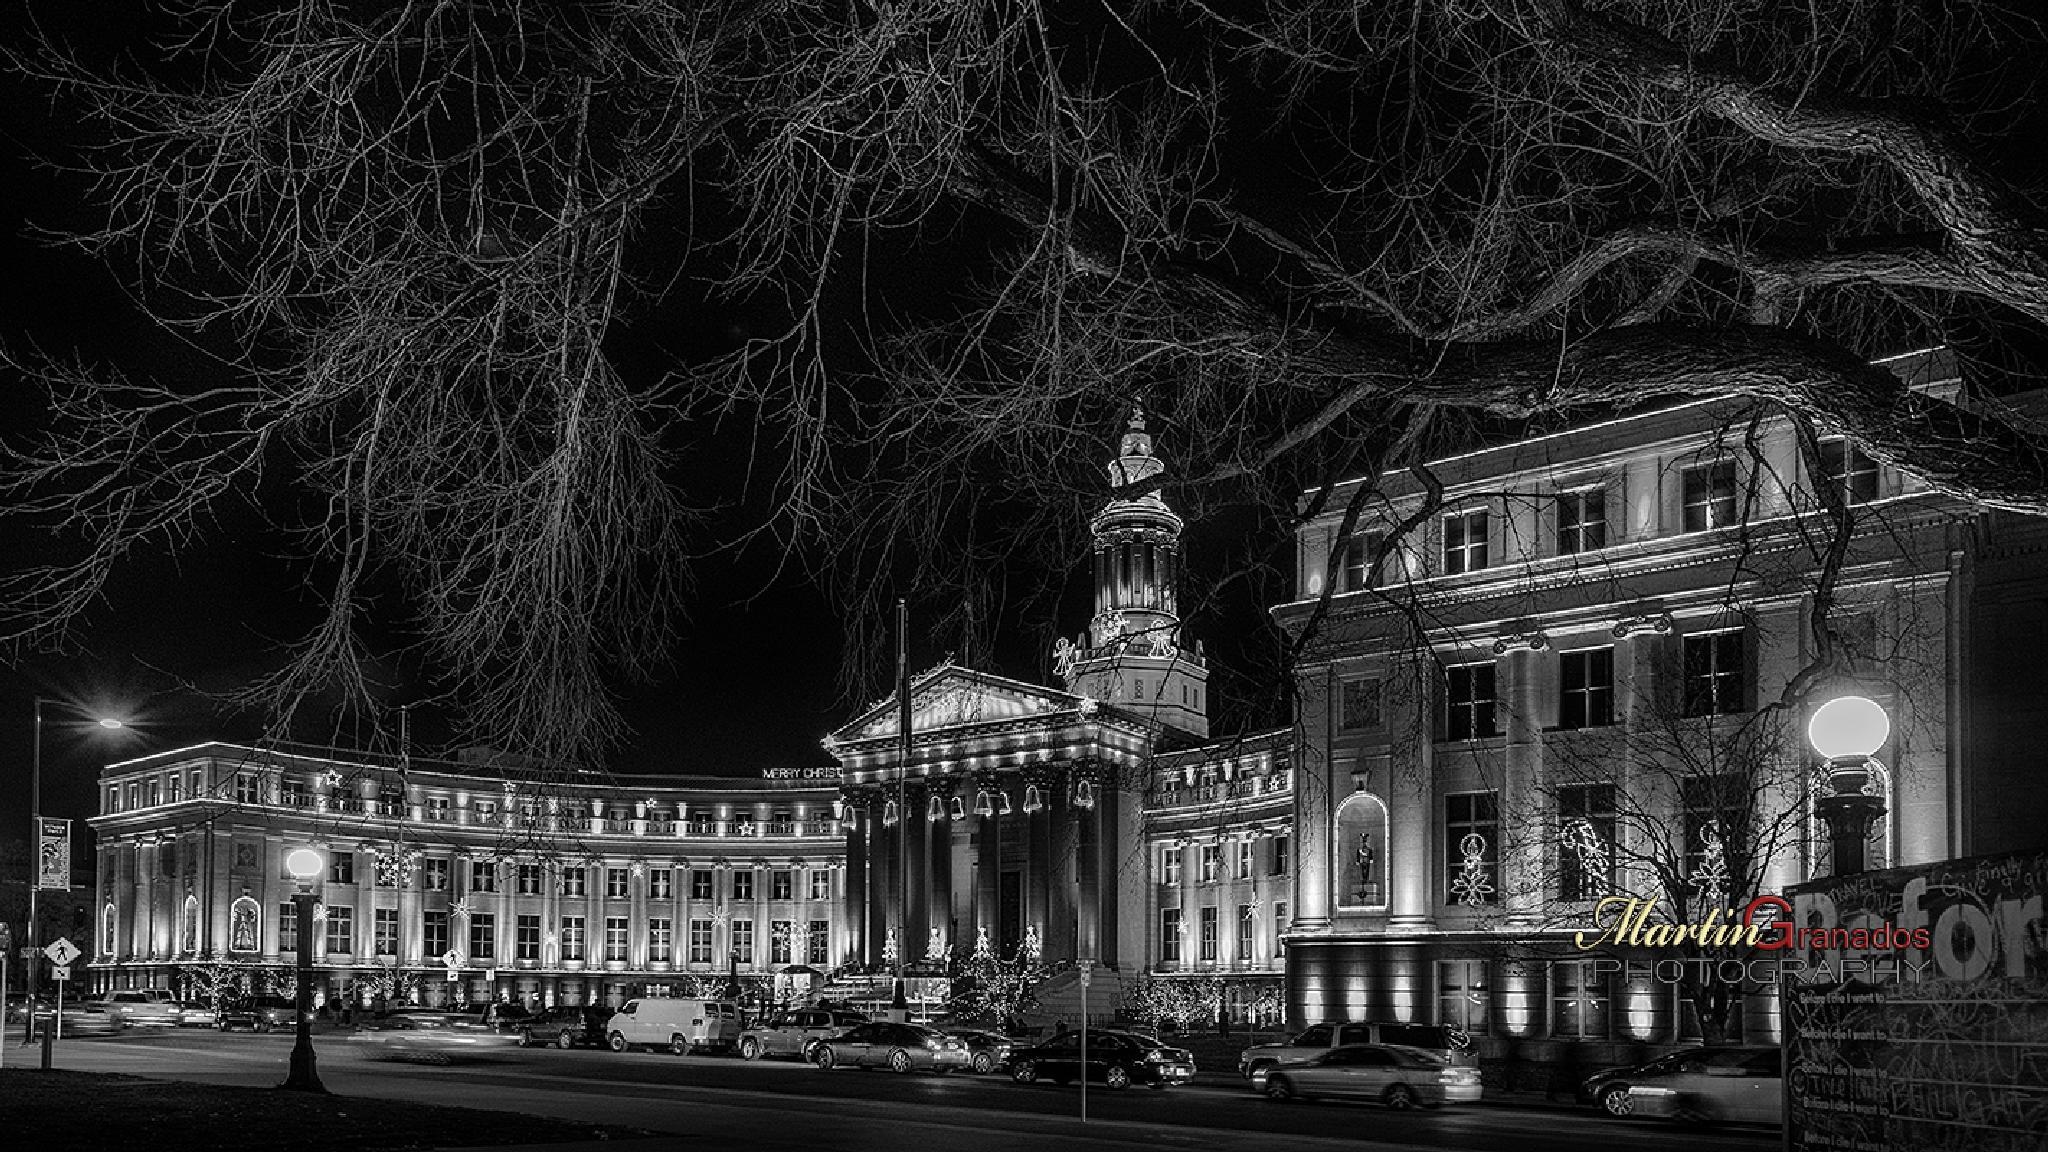 Lights in B/N by MartinGranados